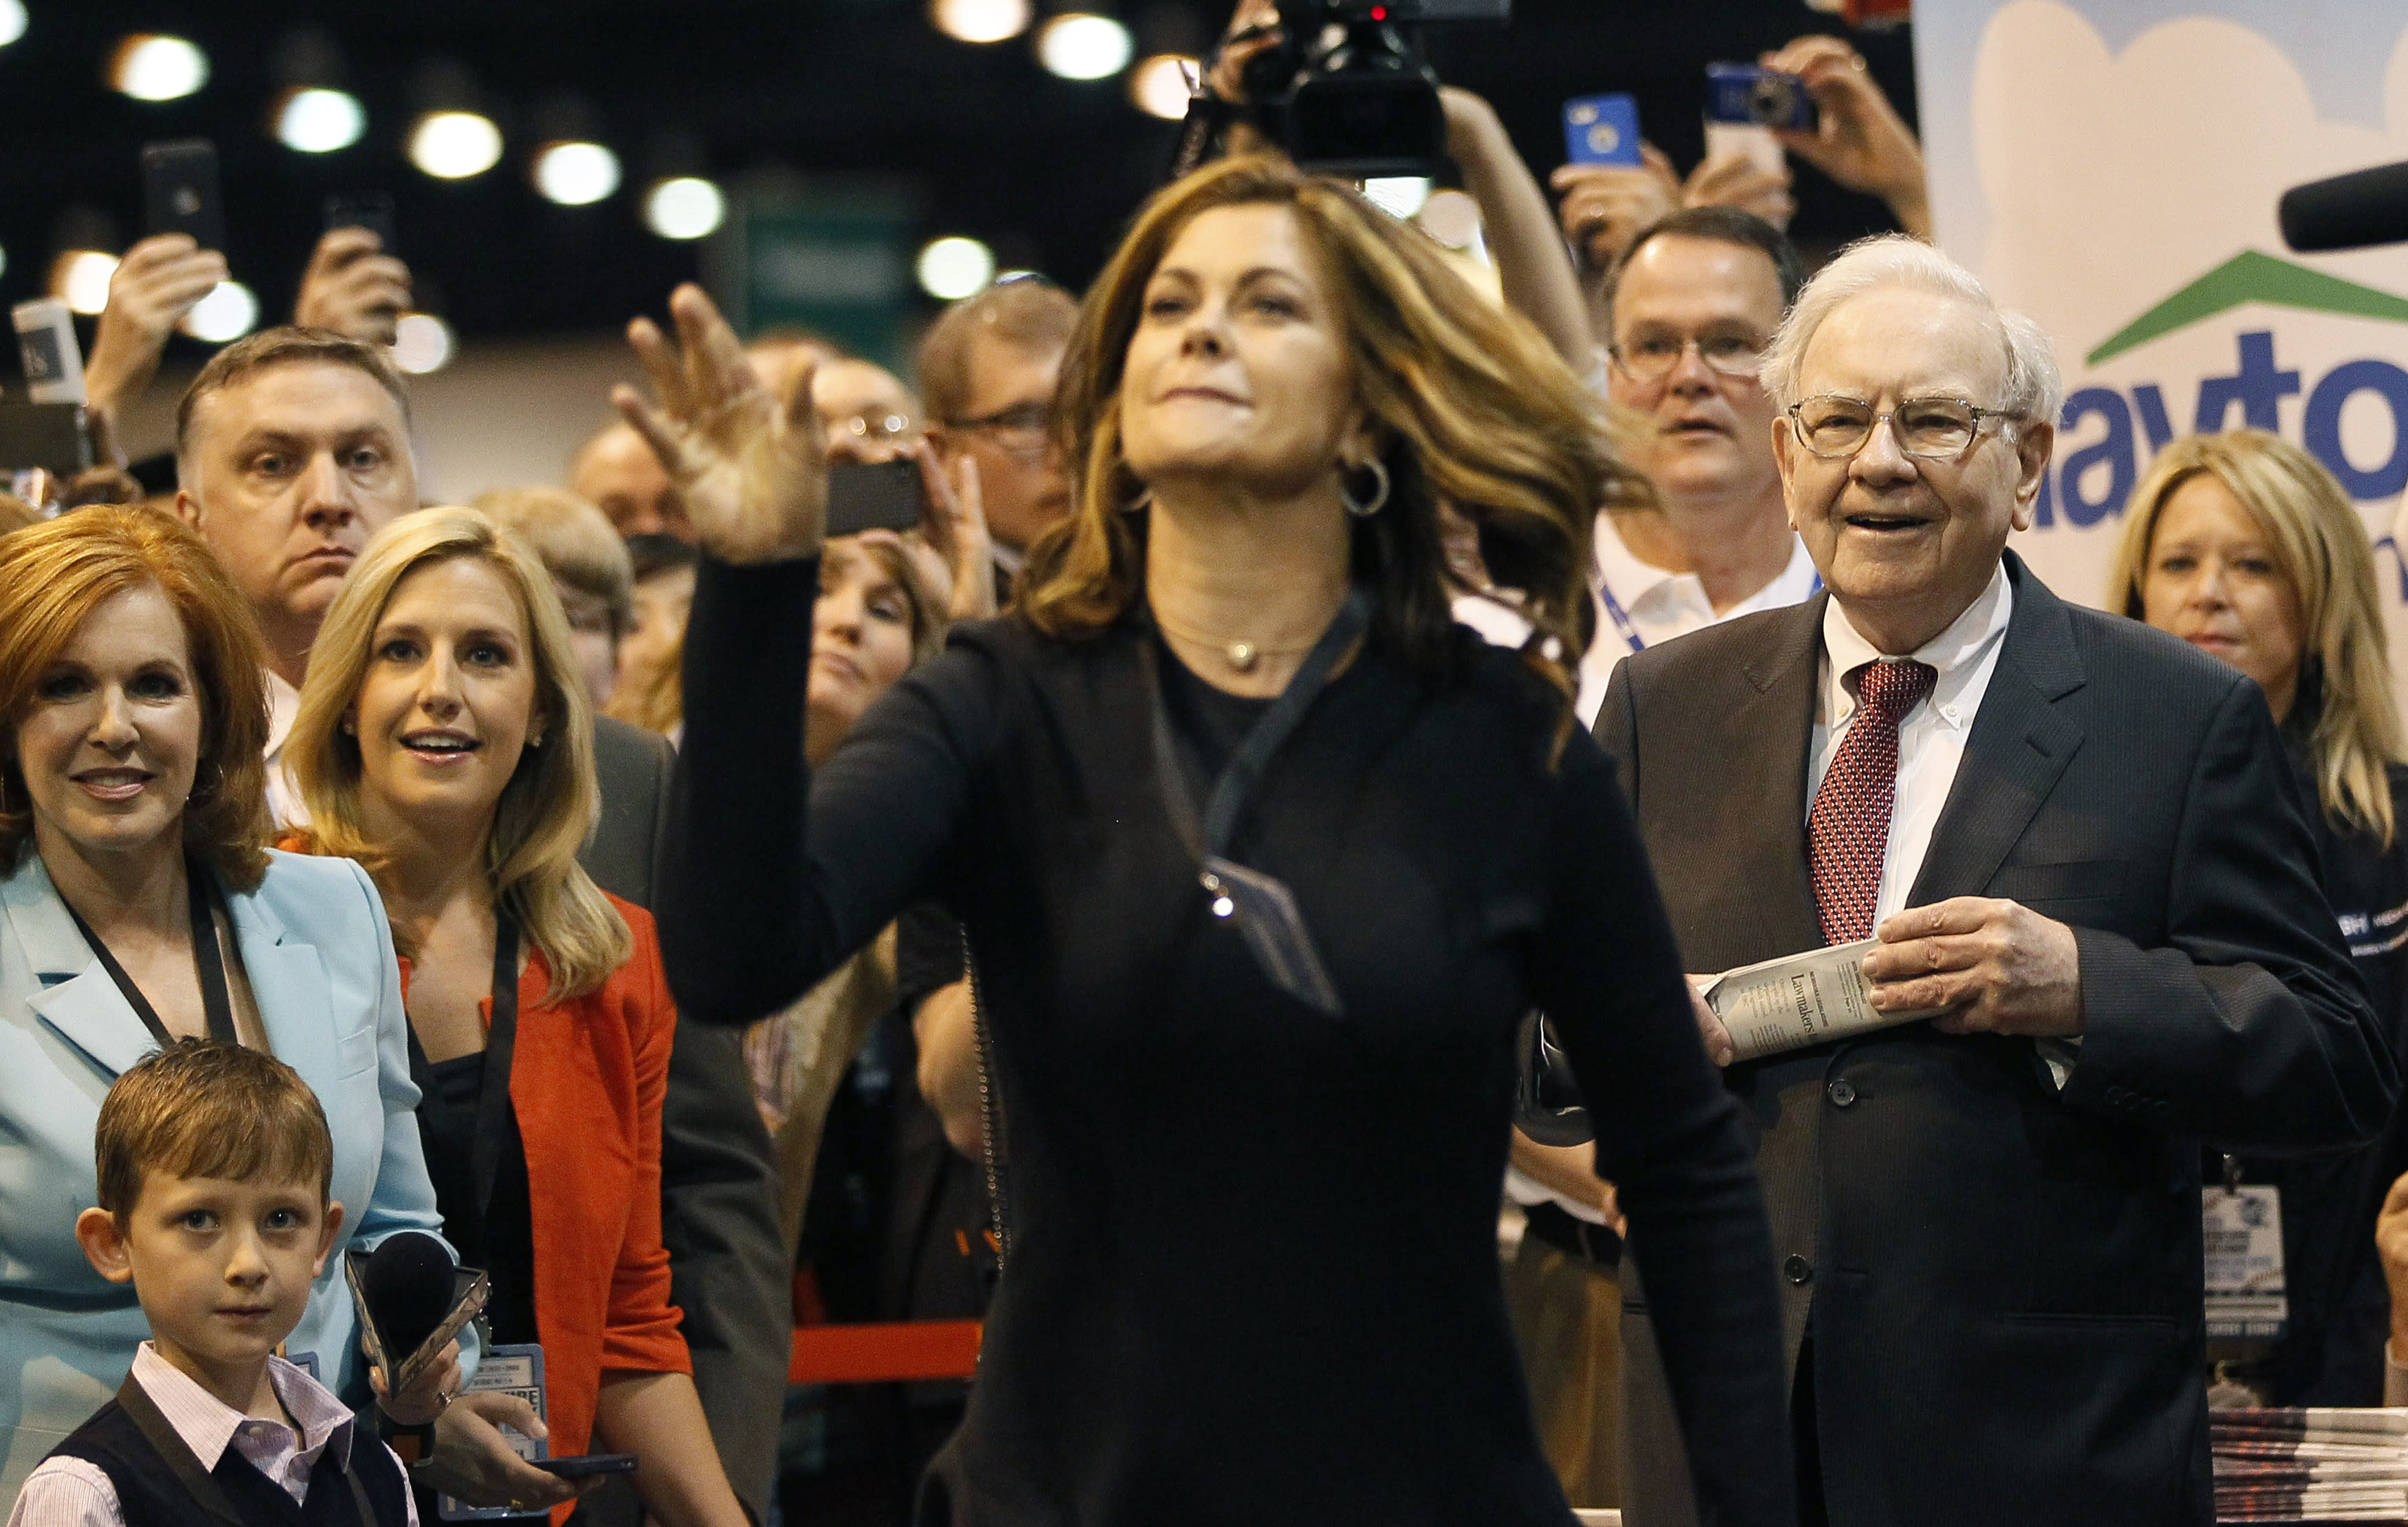 Warren Buffett's work ethic and integrity are 'extraordinary': Kathy Ireland